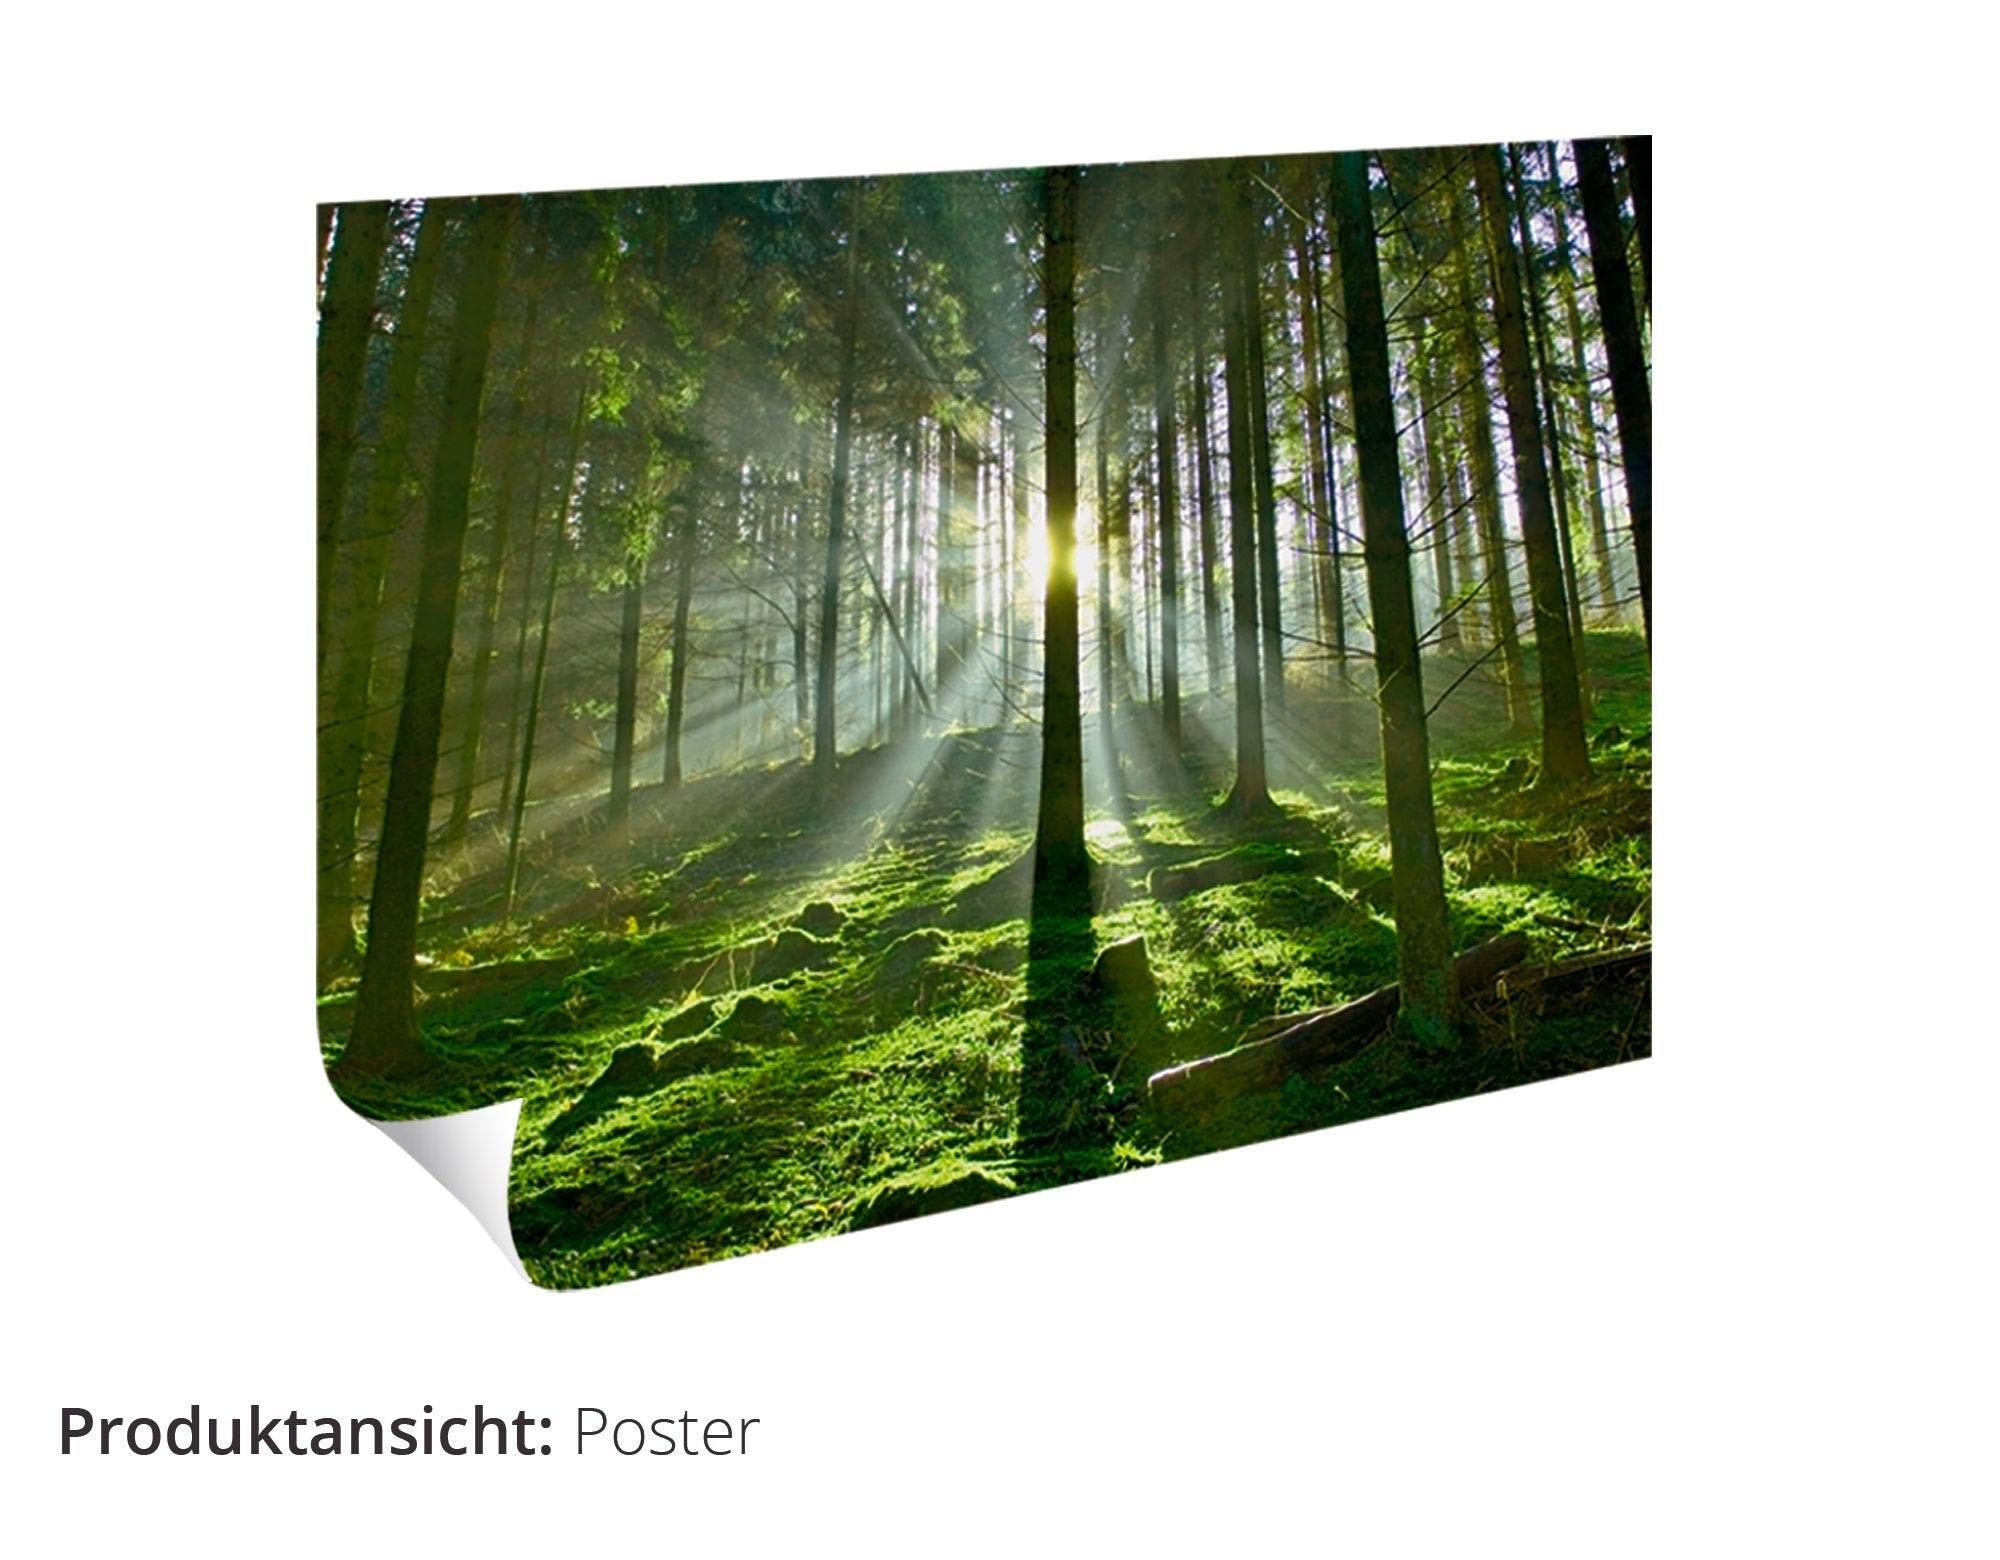 Artland artprint »Fotocollage von 32 bunten Haustüren« nu online kopen bij OTTO